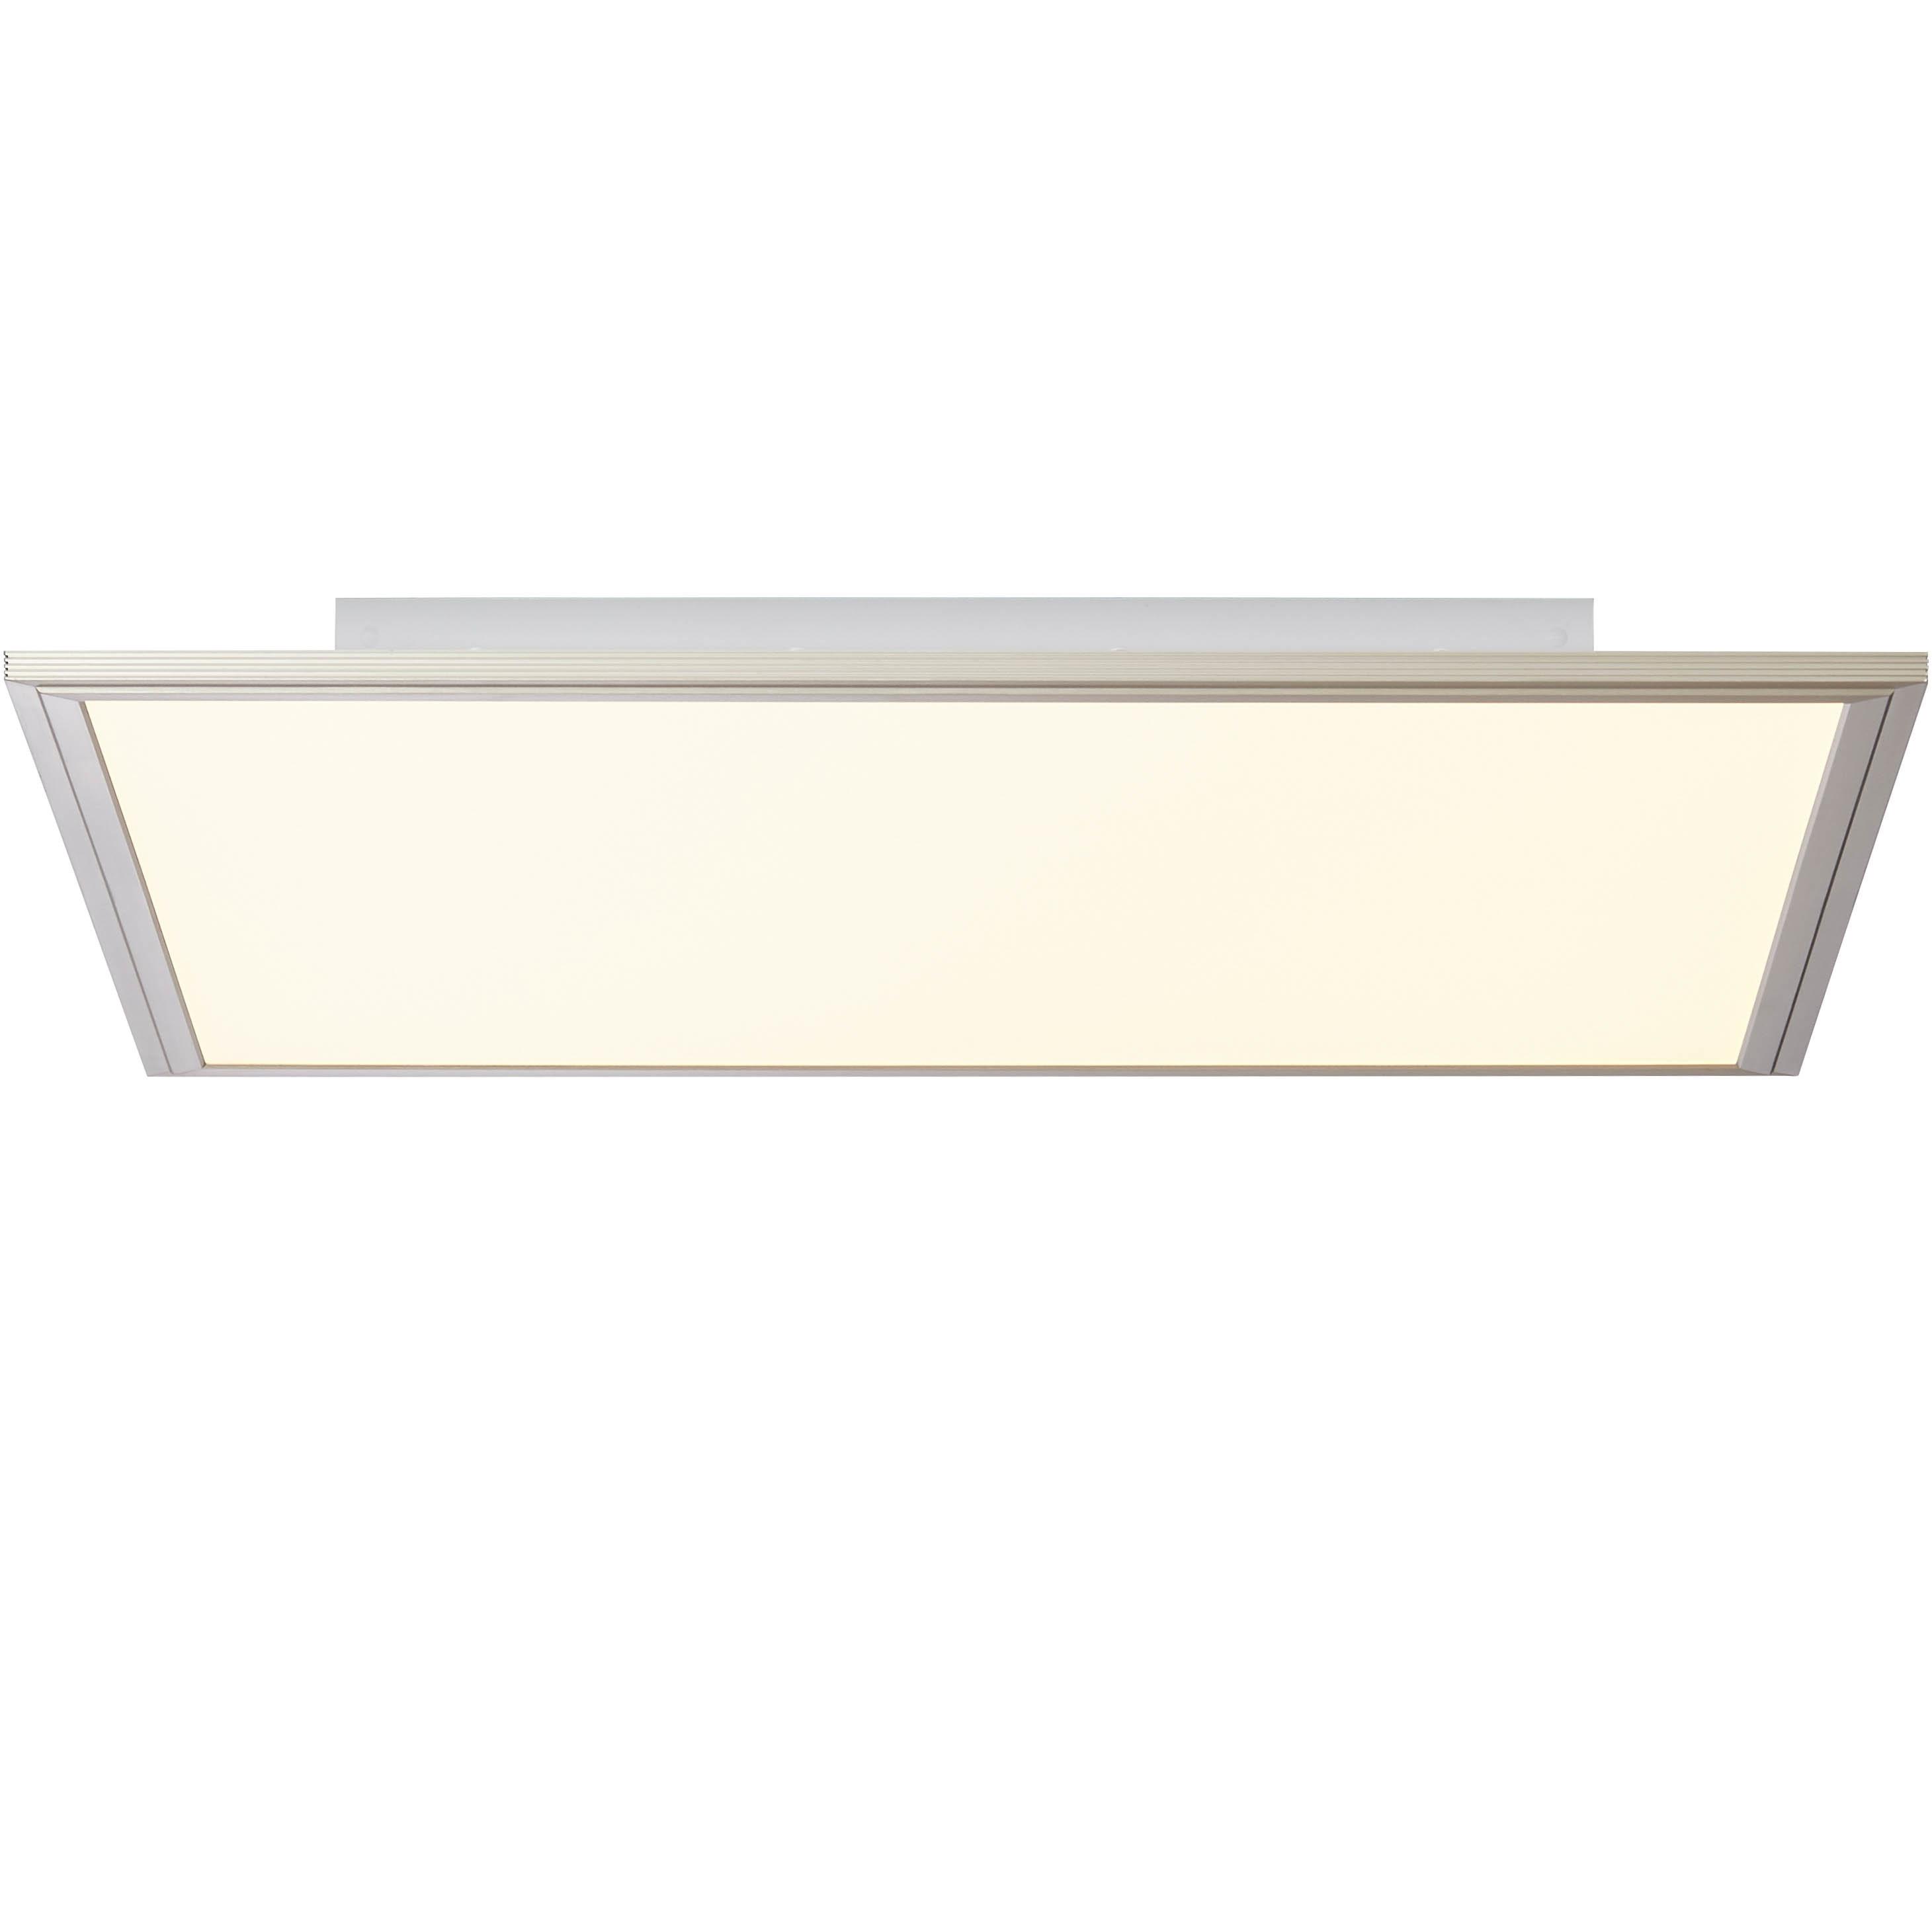 Brilliant Leuchten Flat LED Deckenaufbau-Paneel 60x60cm nickel eloxiert